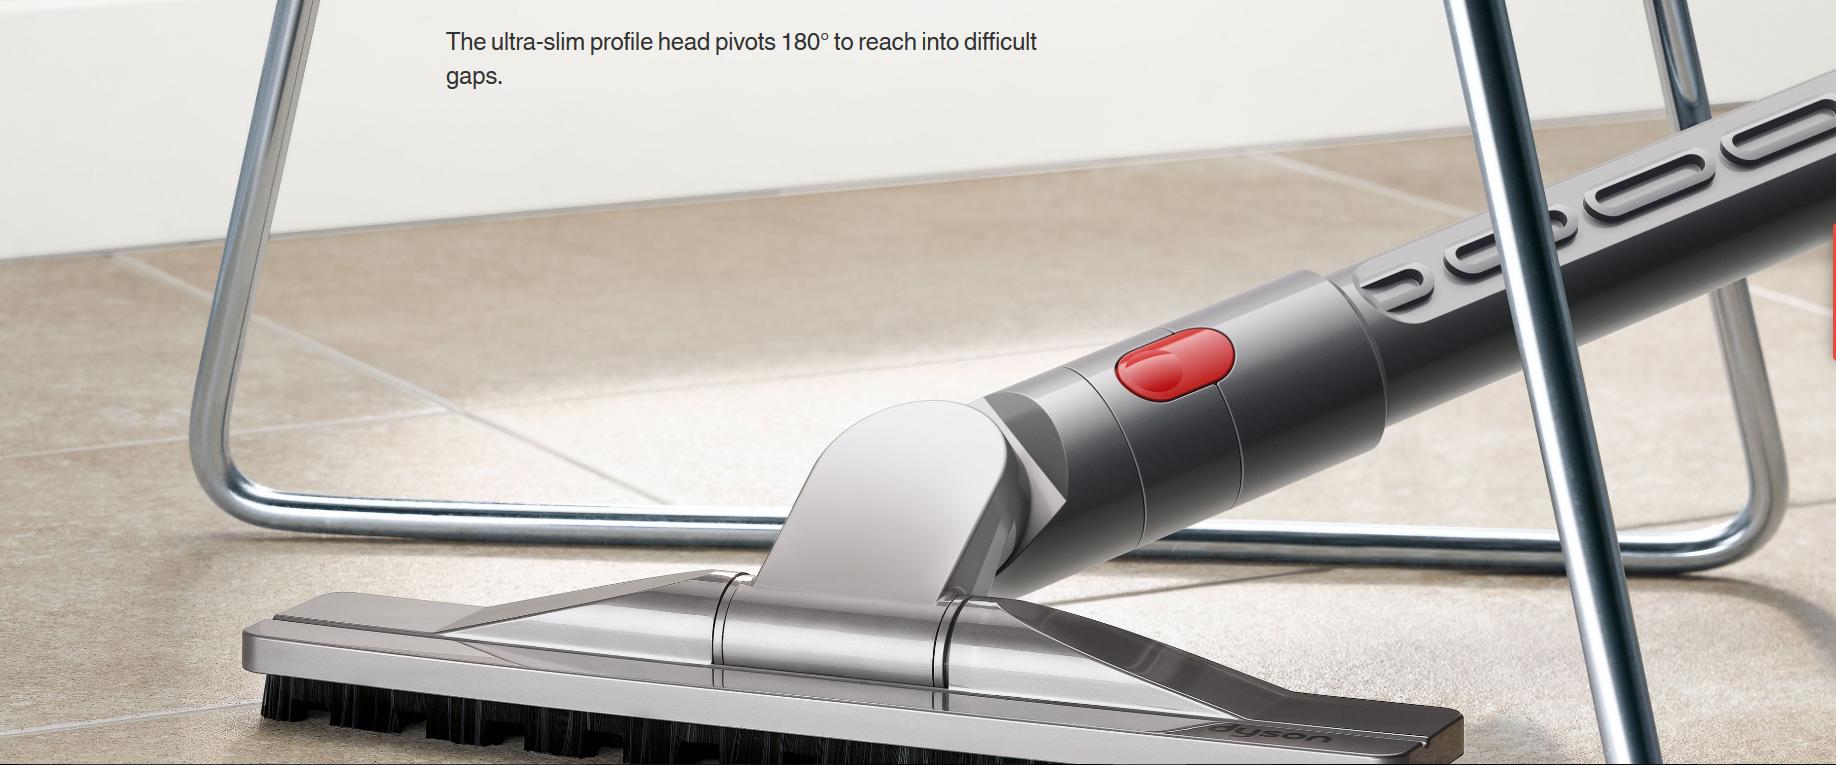 Dyson Articulating Hard Floor Tool Amazon Ca Home Amp Kitchen